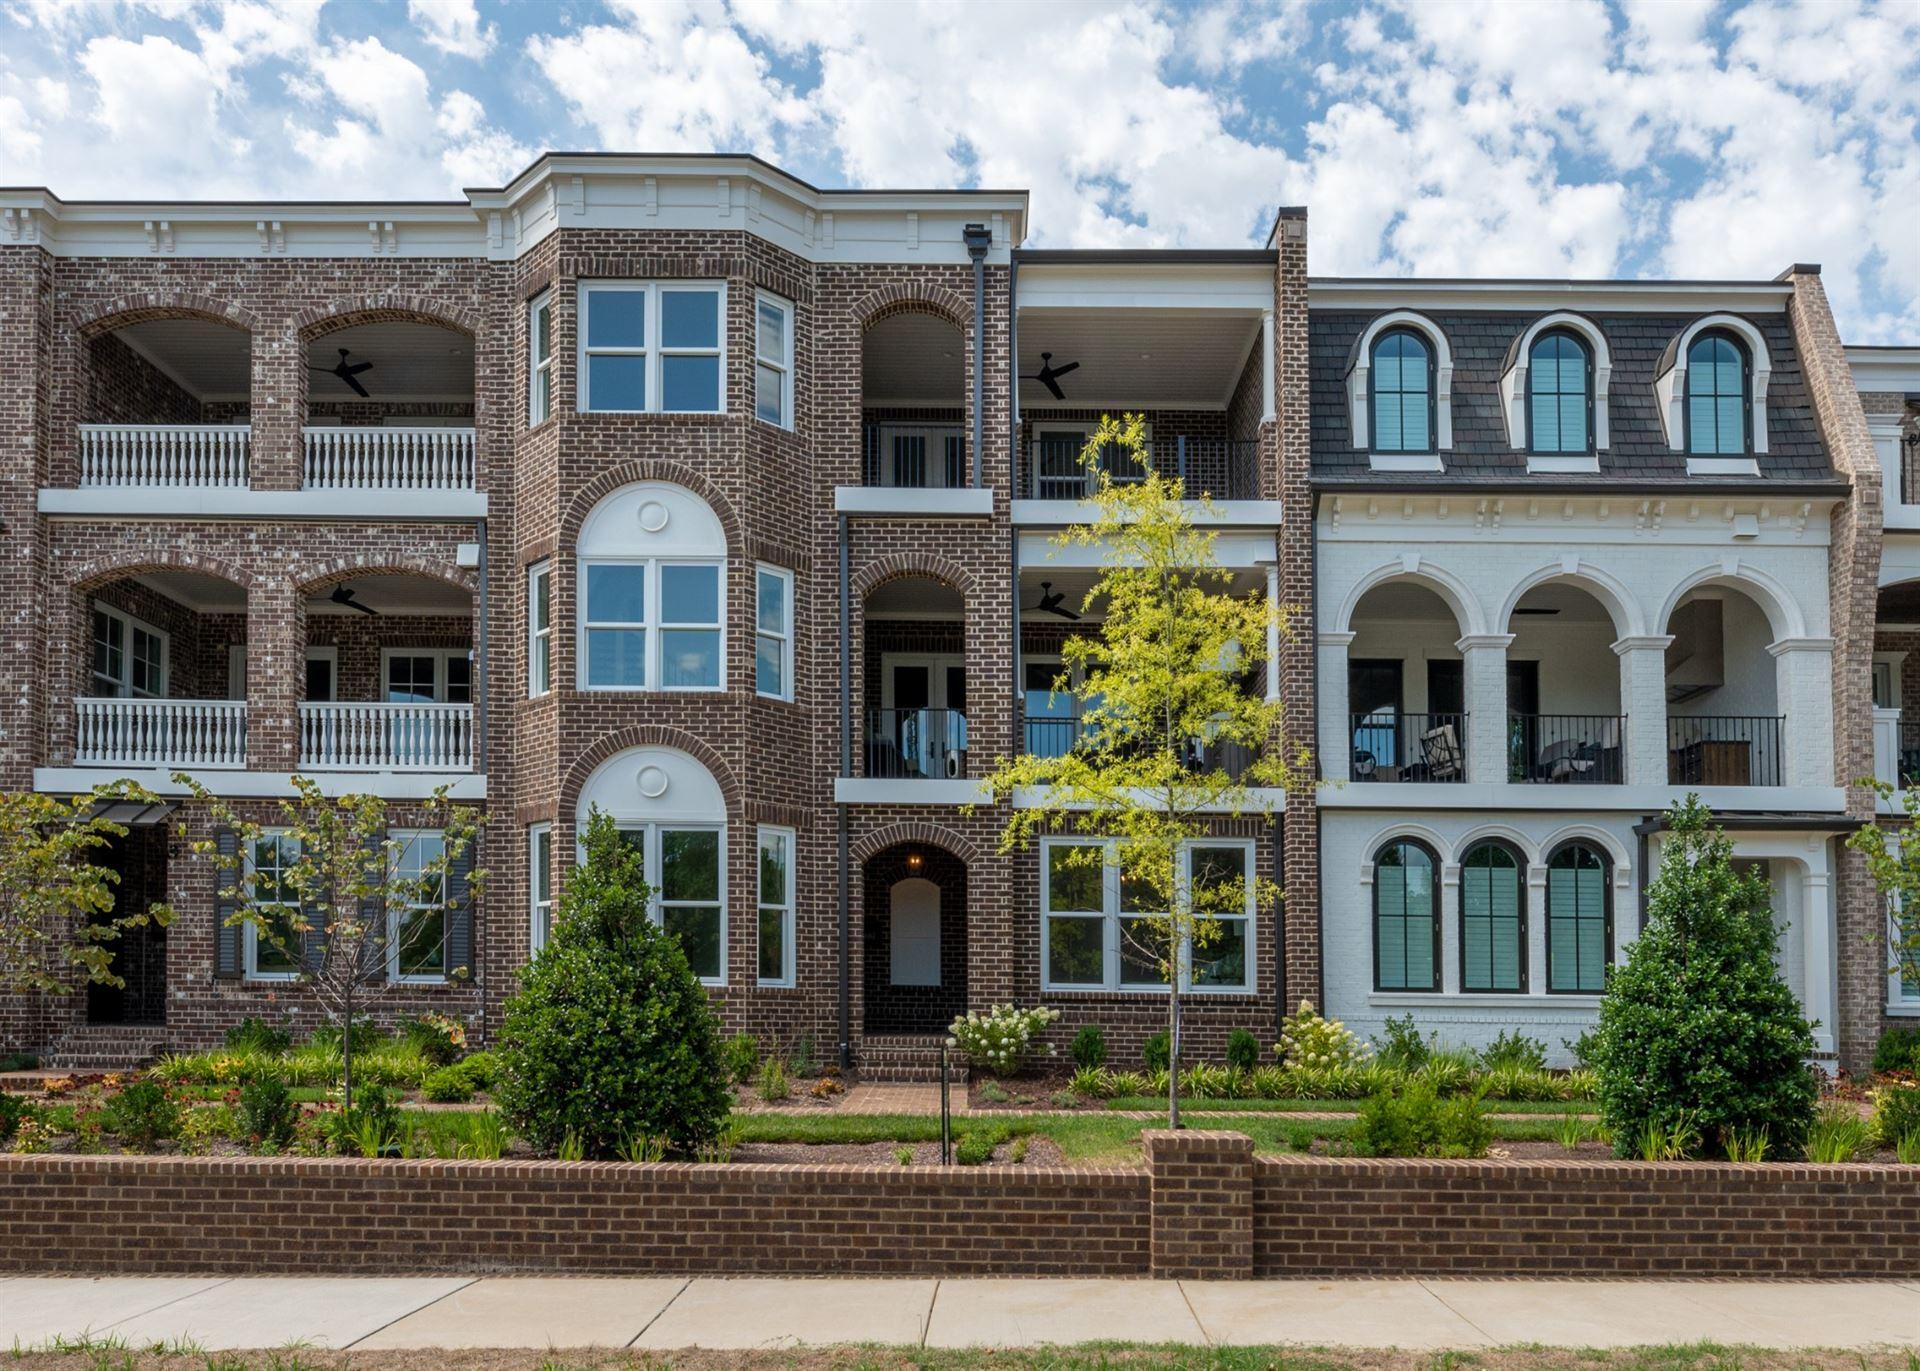 3606C West End Ave. (#111), Nashville, TN 37205 - MLS#: 2138491